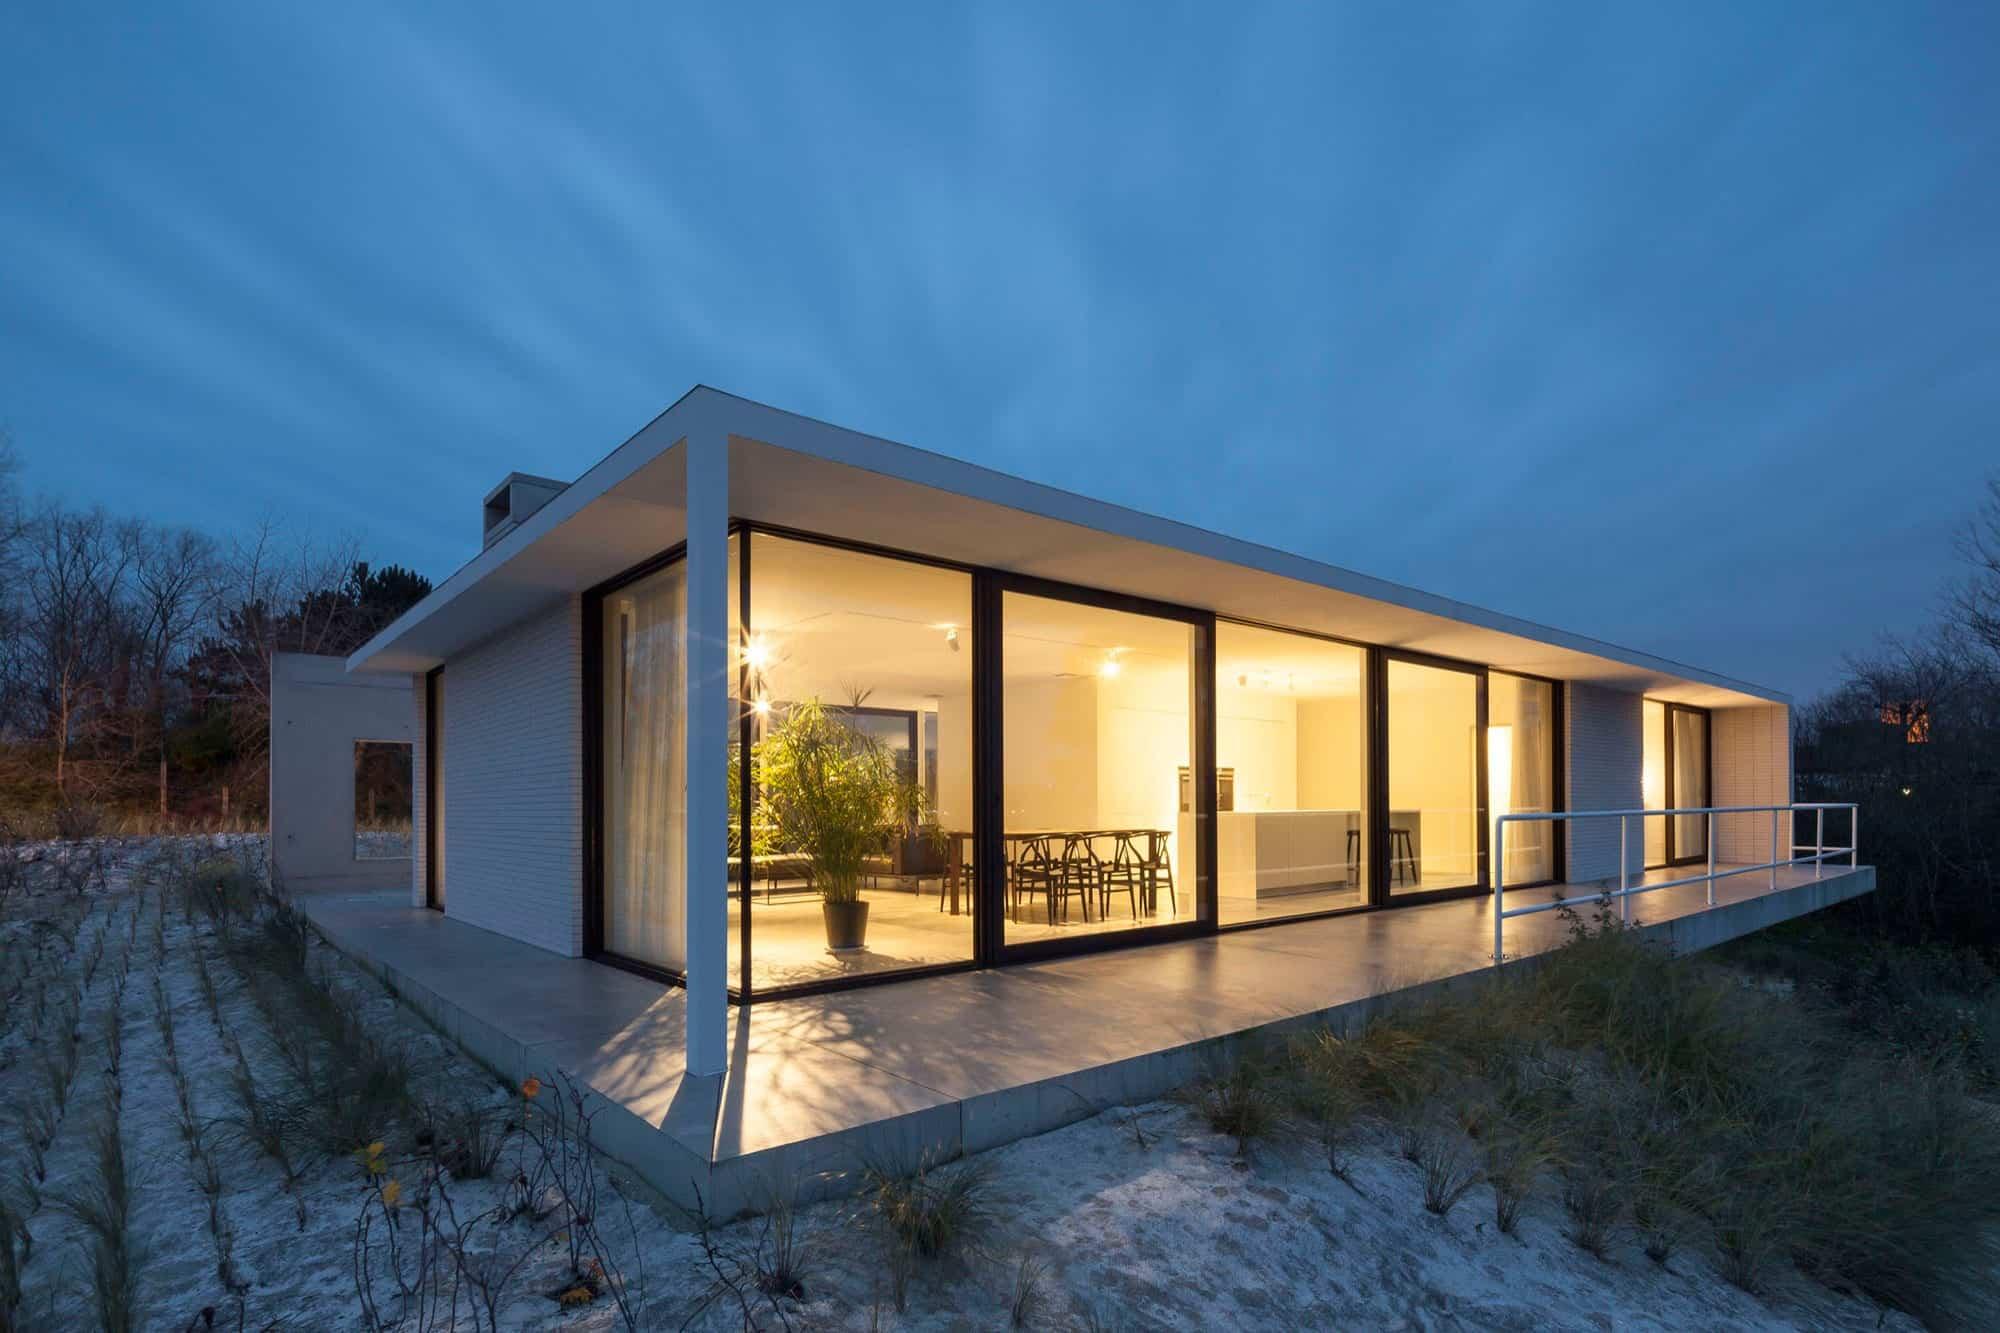 OOA | Office O Architects Design a Contemporary Villa in Oostduinkerke, Belgium